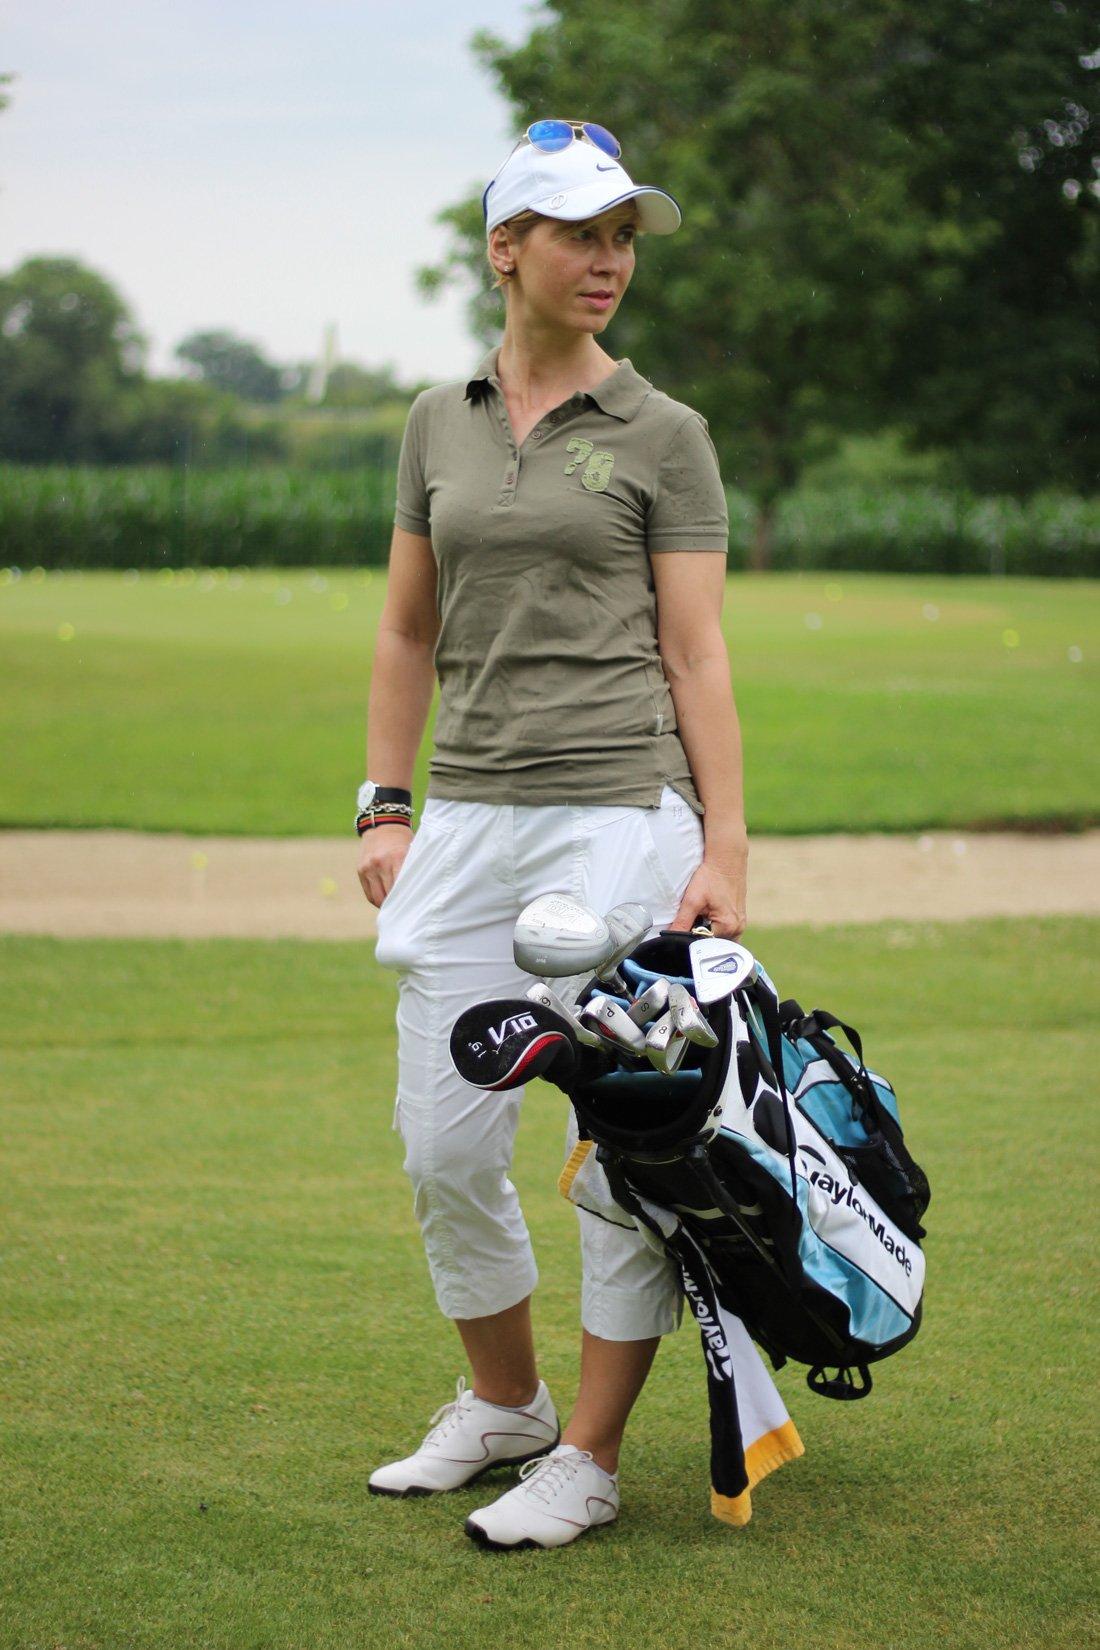 Golfclub Sagmühle, Conny Doll spielt Golf, wo gehts lang,